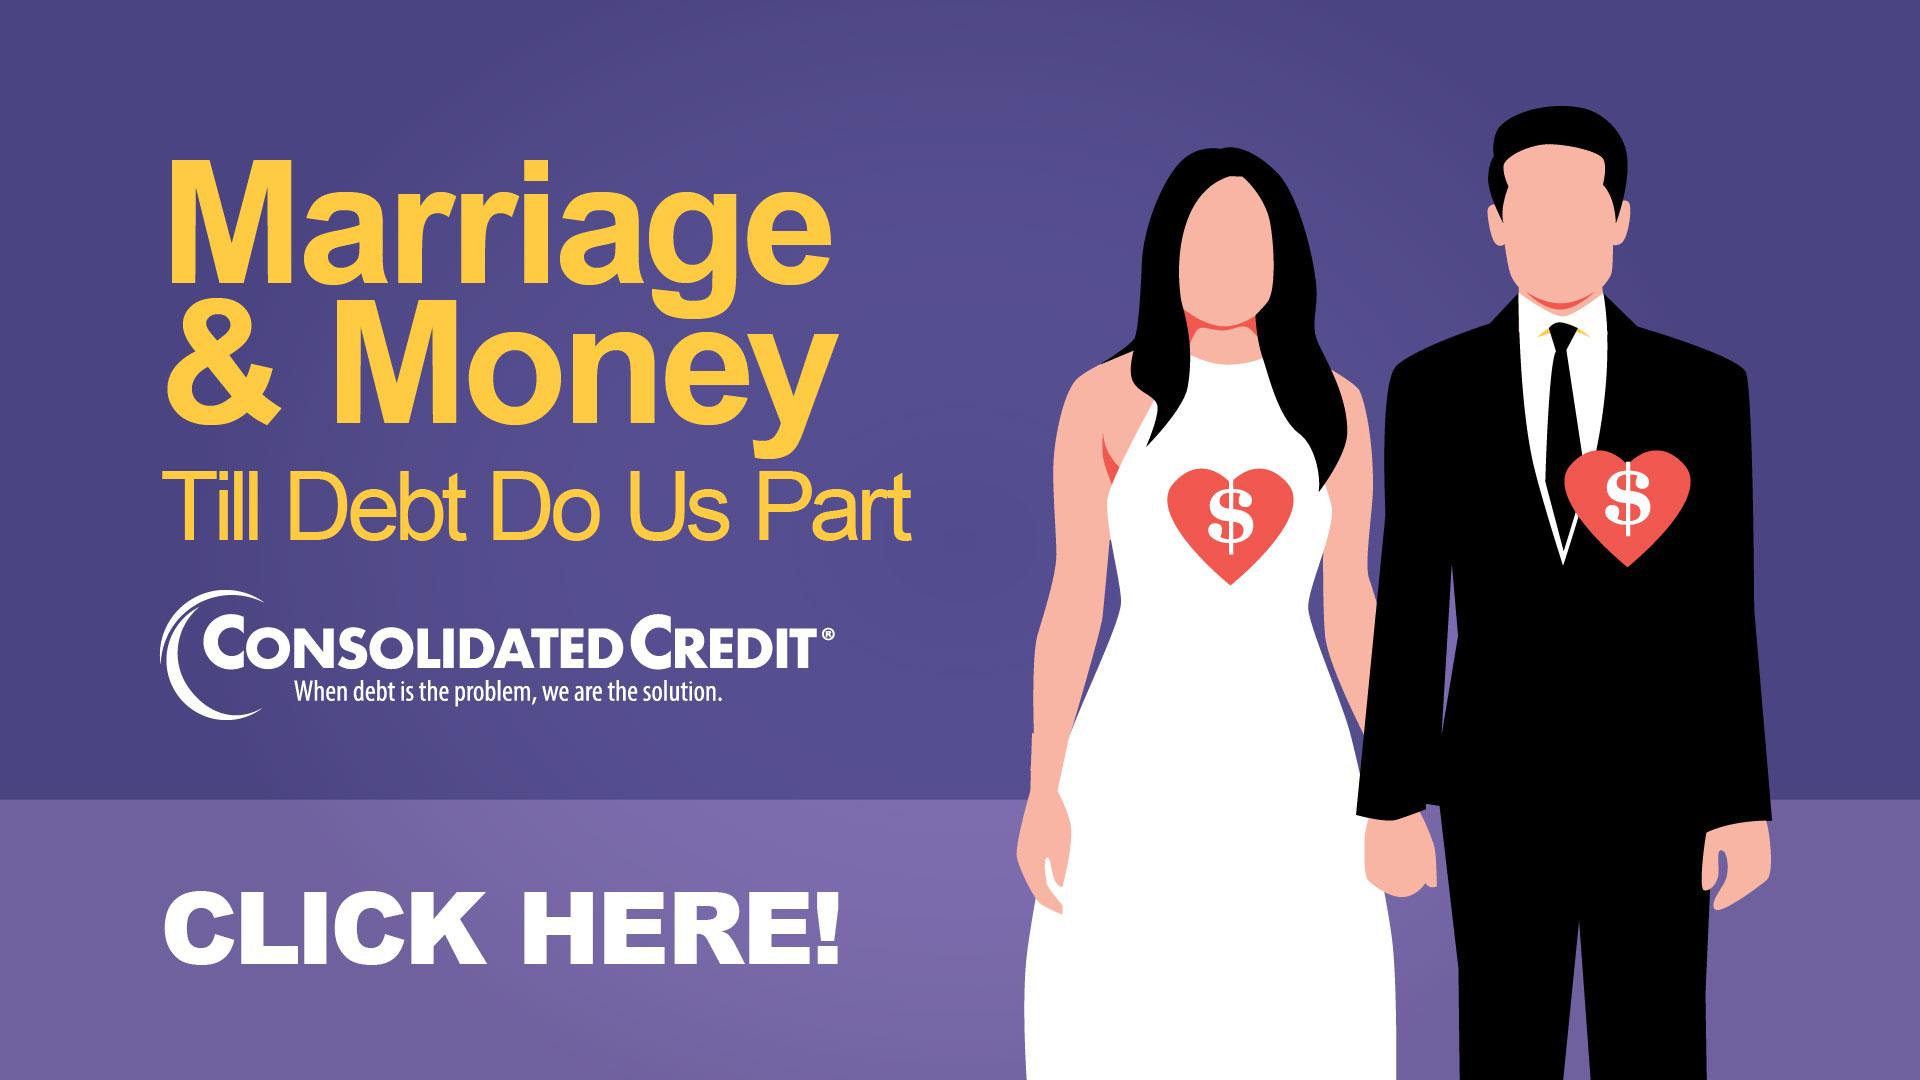 https://www.consolidatedcredit.org/wp-content/uploads/2017/06/09-September_1920x1080.jpg